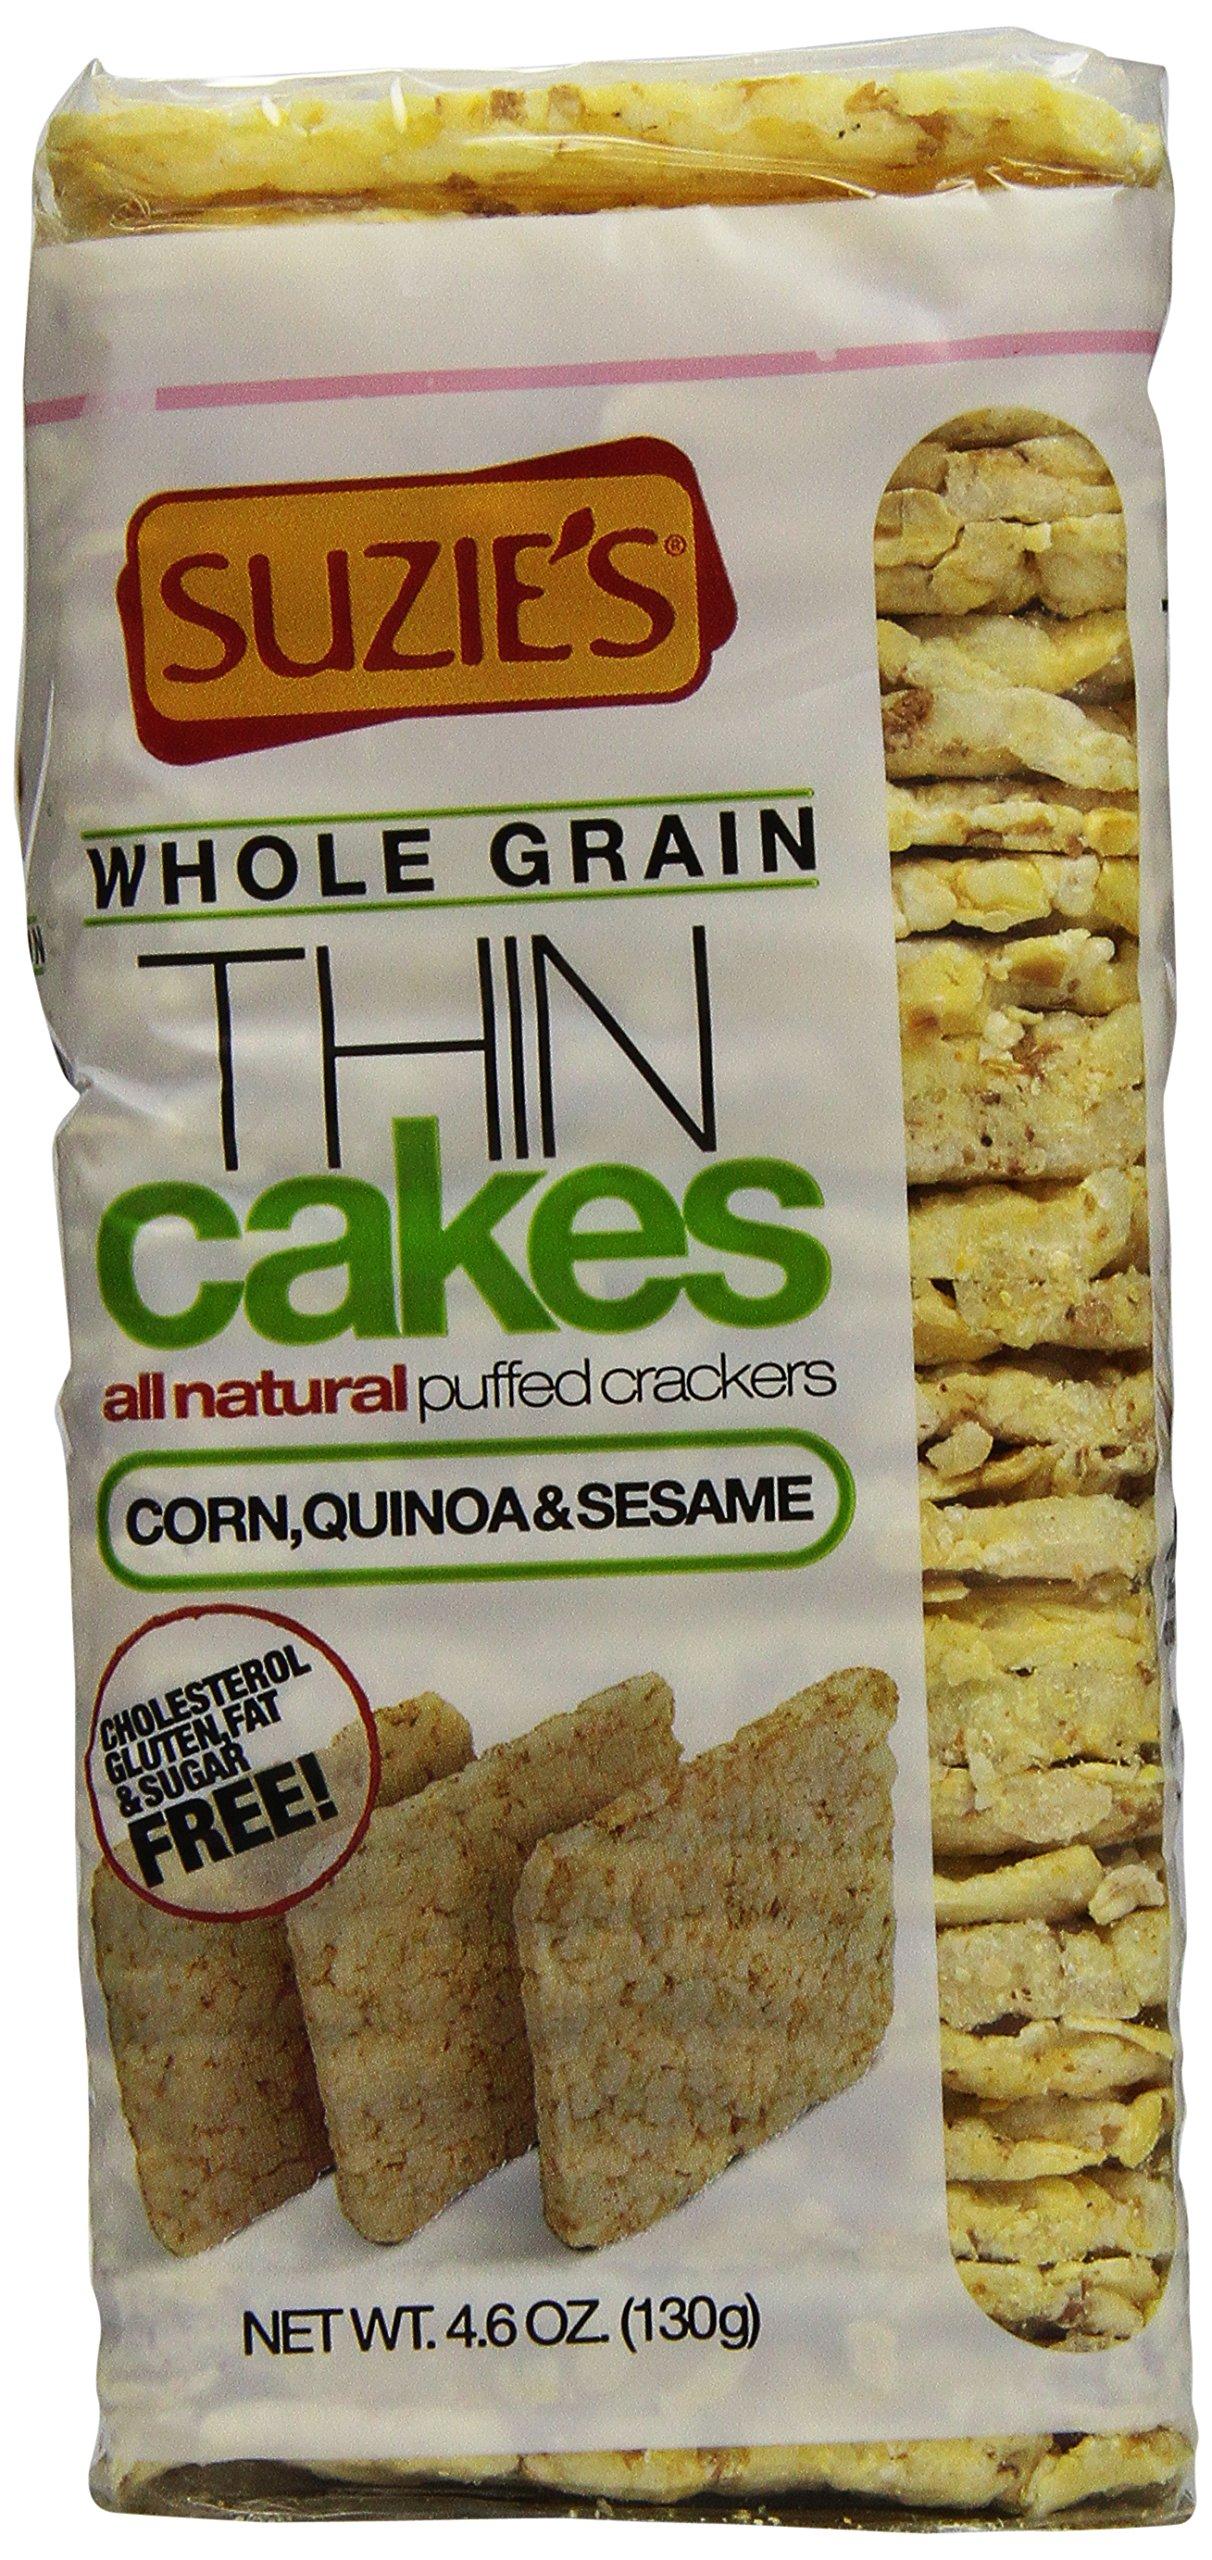 Suzie's Whole Grain Thin Cakes, Puffed Corn Quinoa and Sesame, 4.6 oz